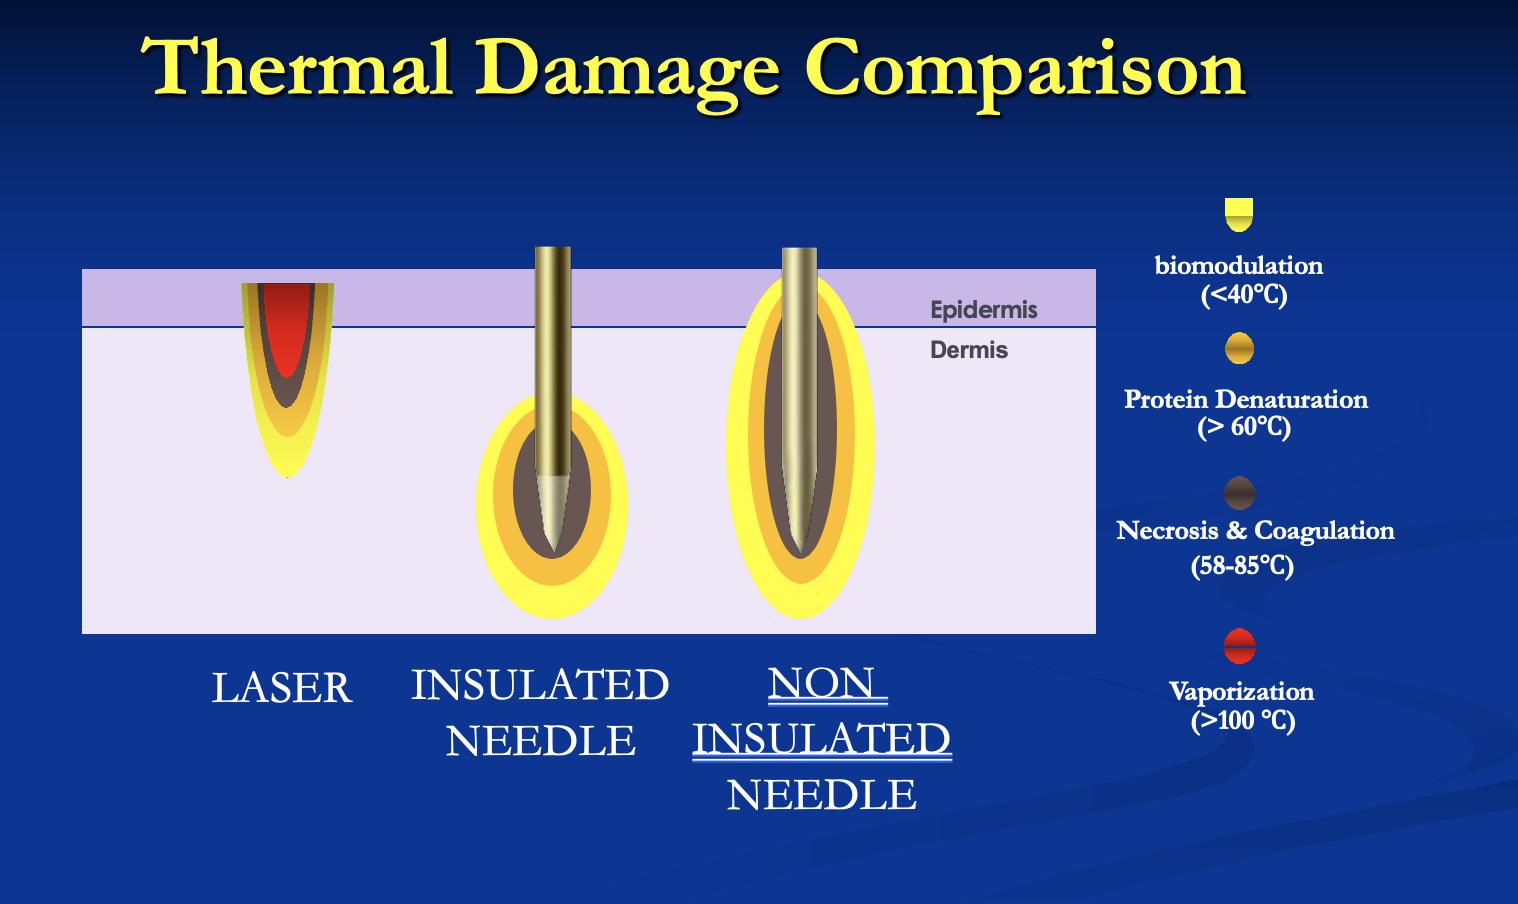 Thermal Damage Comparison